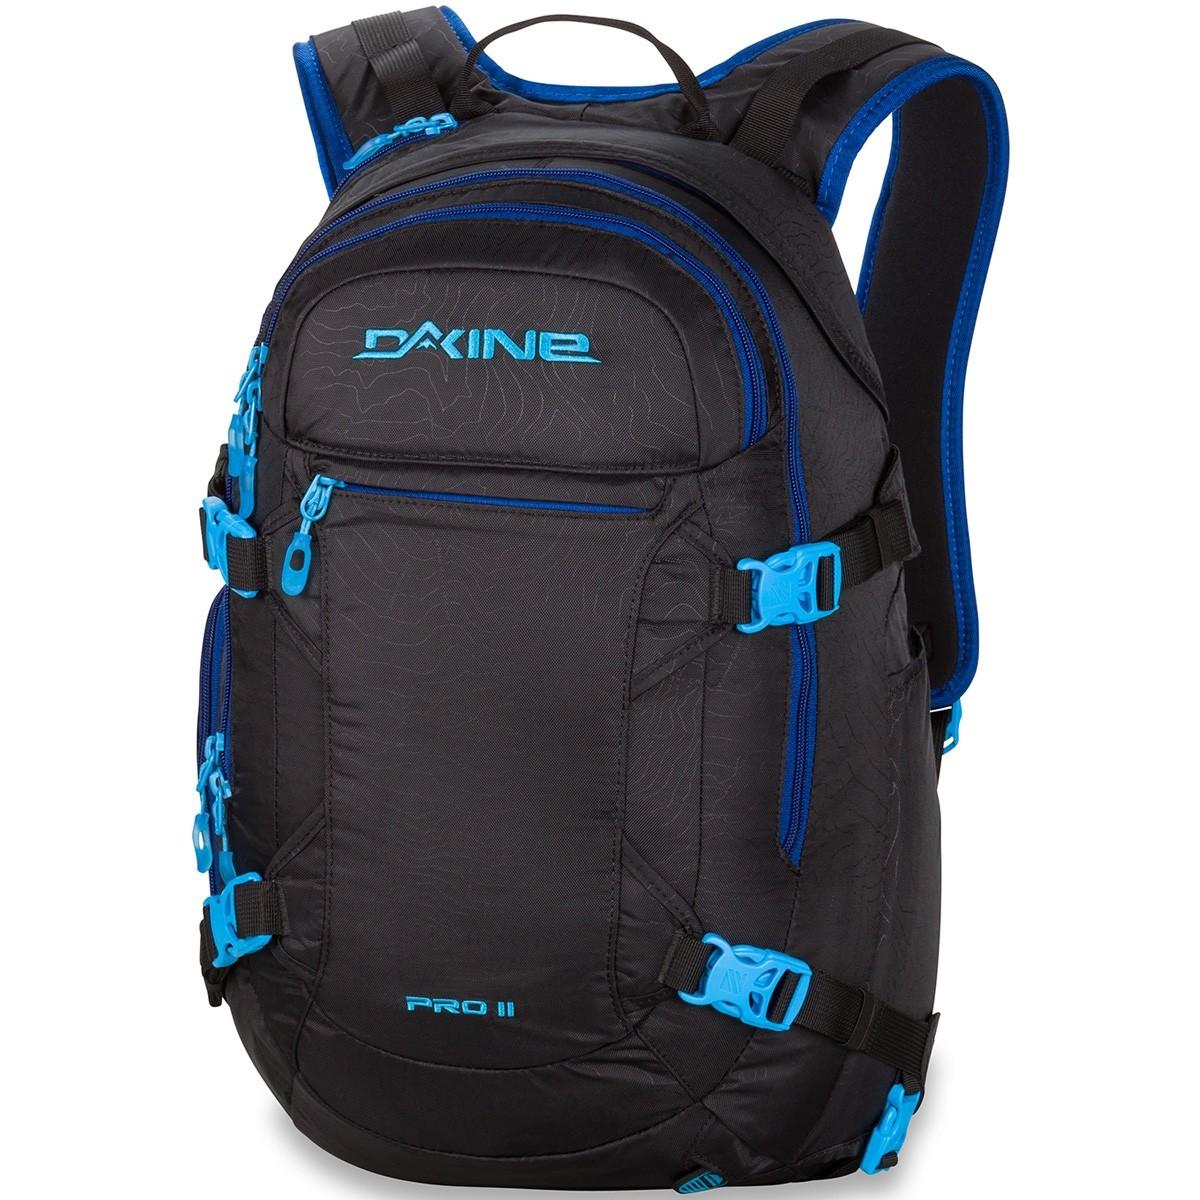 Dakine PRO II 26L Рюкзак для сноуборда Dakine Pro II 26L Glacier dakine-heli-pro-ii-26l-backpack-2015-glacier.jpg